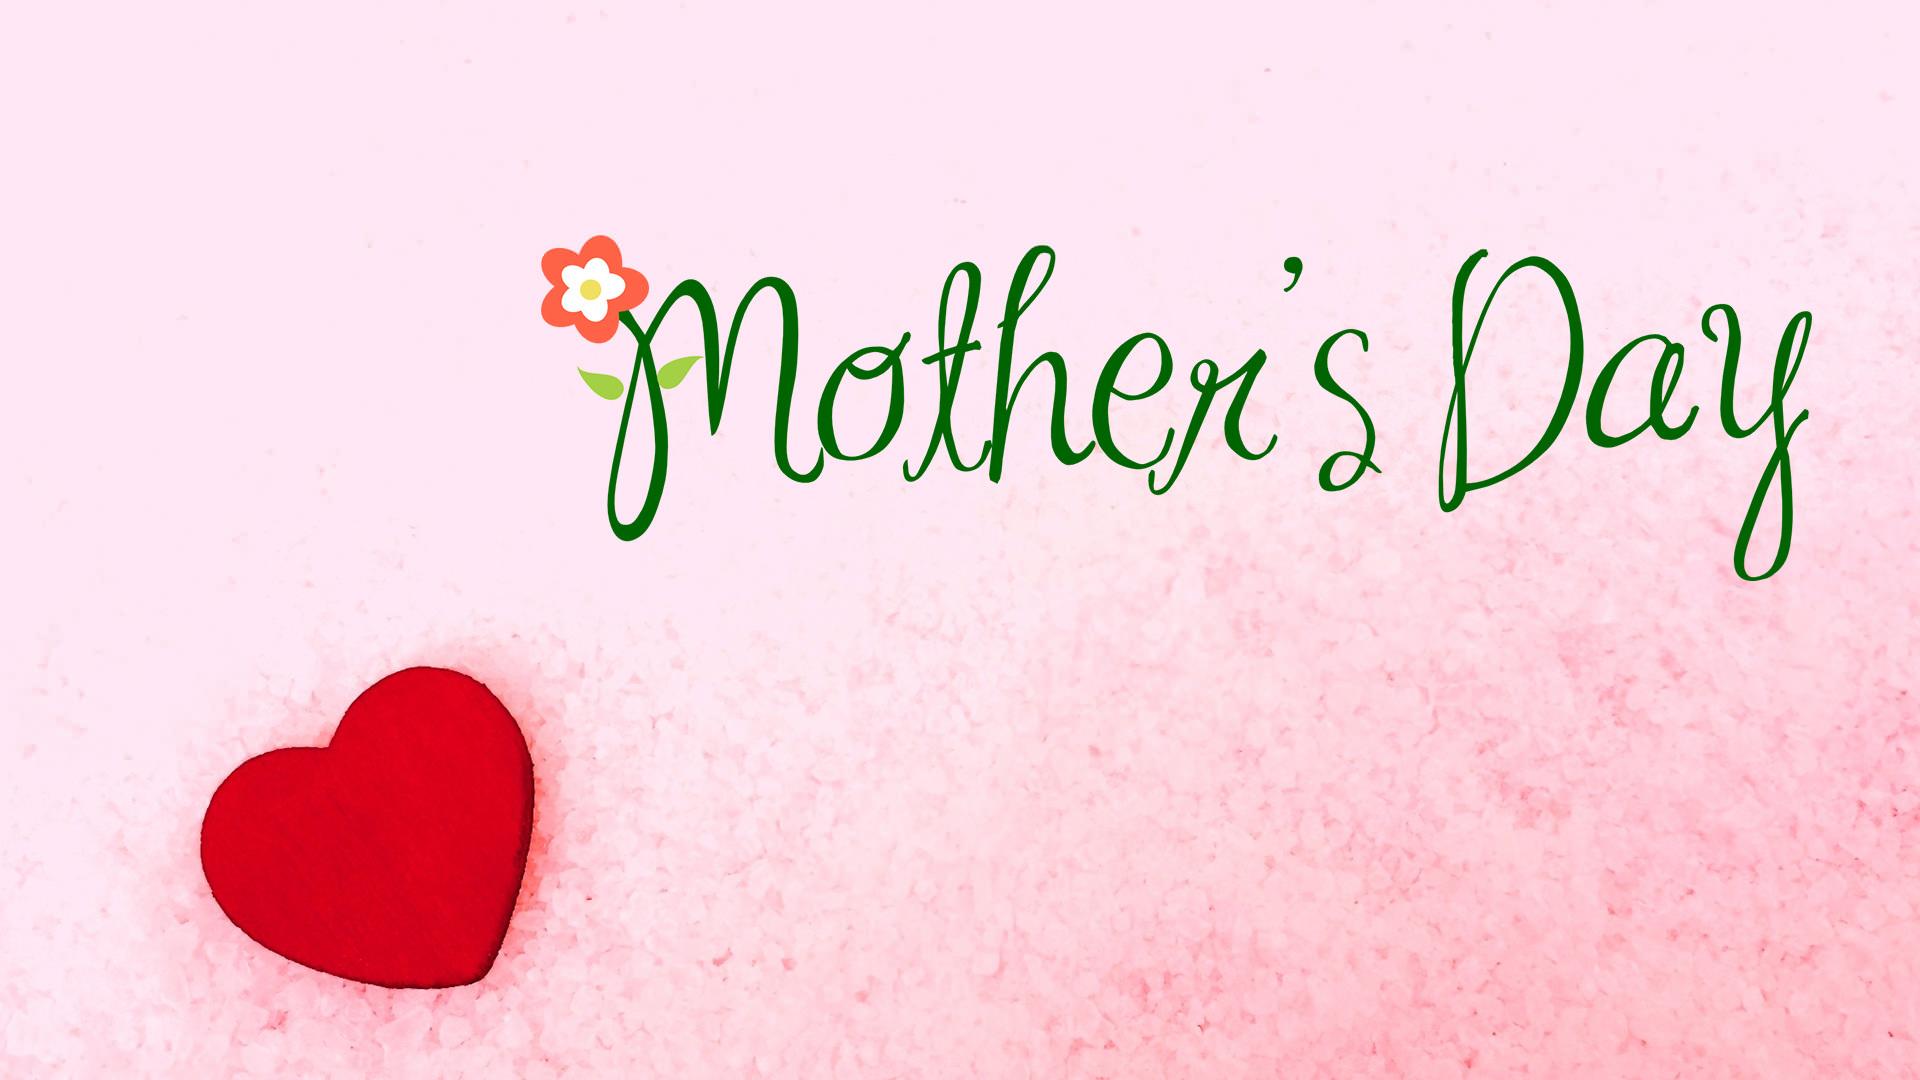 Mothers Day Screensavers Desktop: Mother S Day Wallpaper